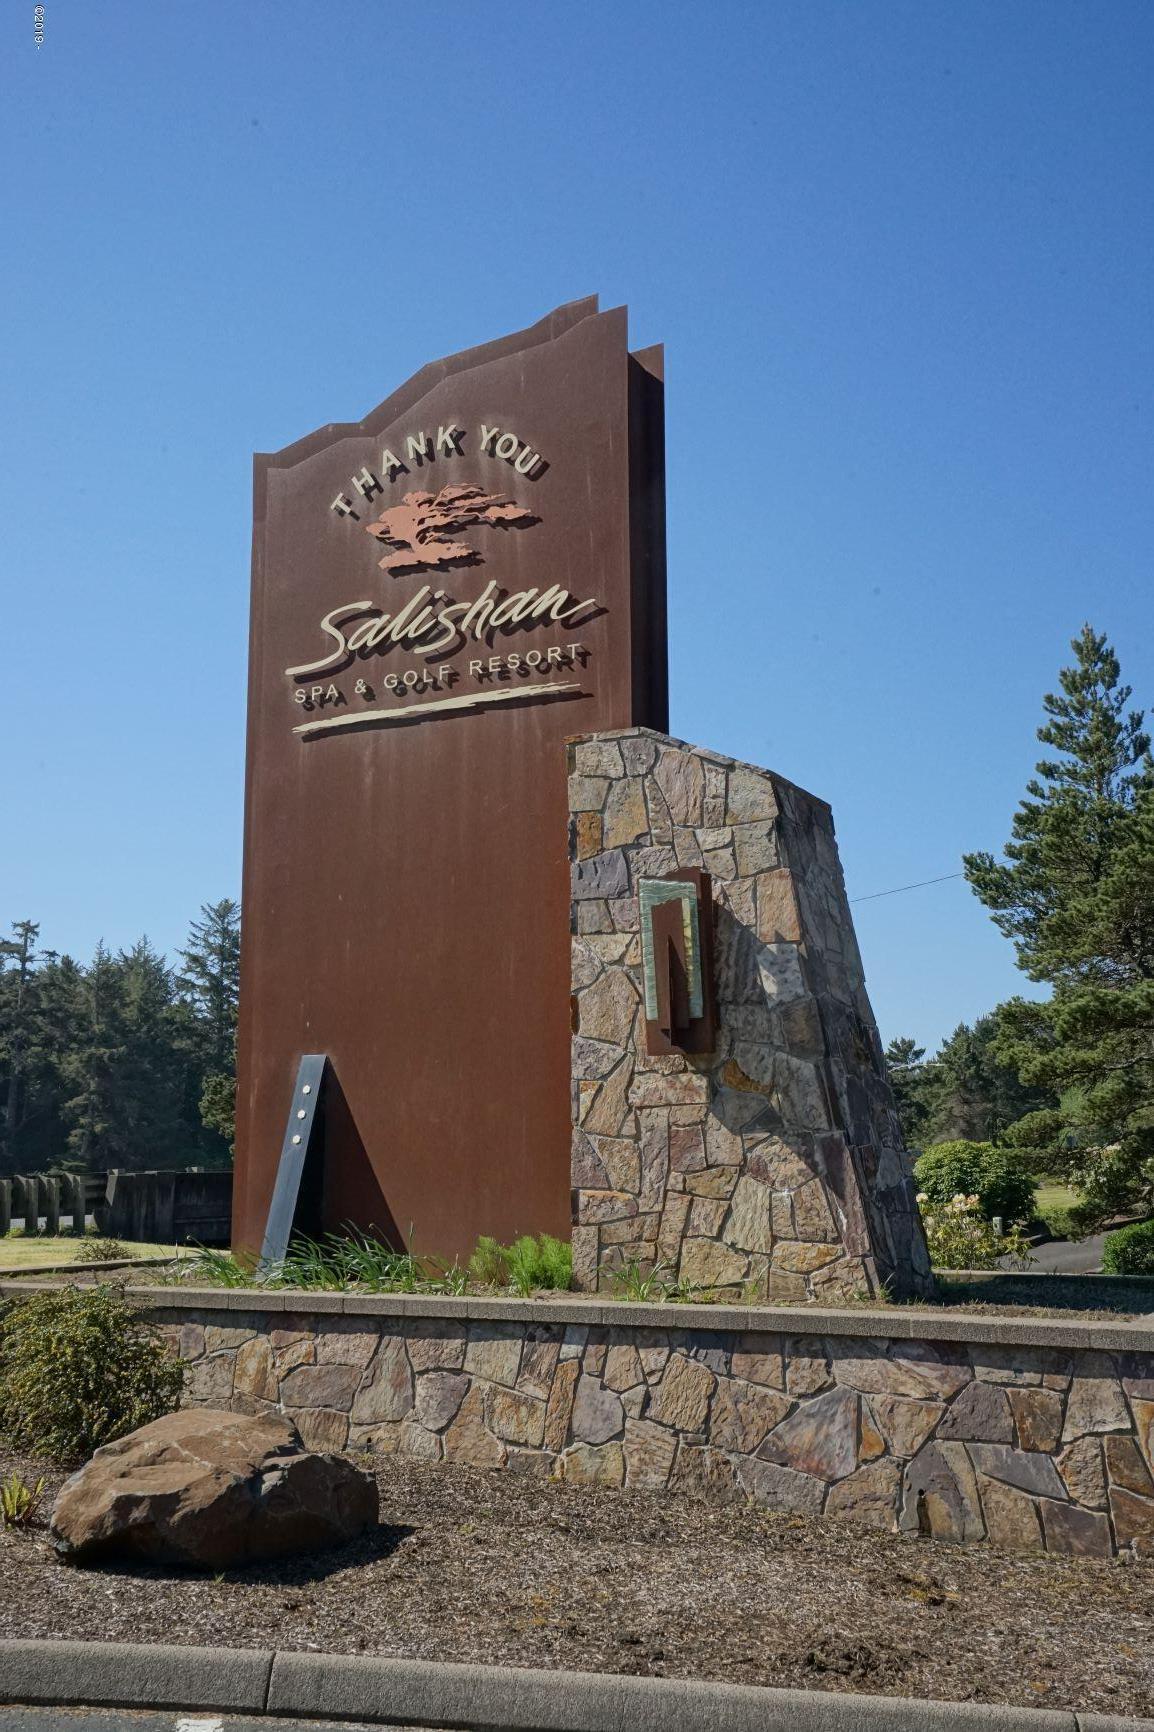 556 Fairway Dr, Gleneden Beach, OR 97388 - Salishan spa and golf